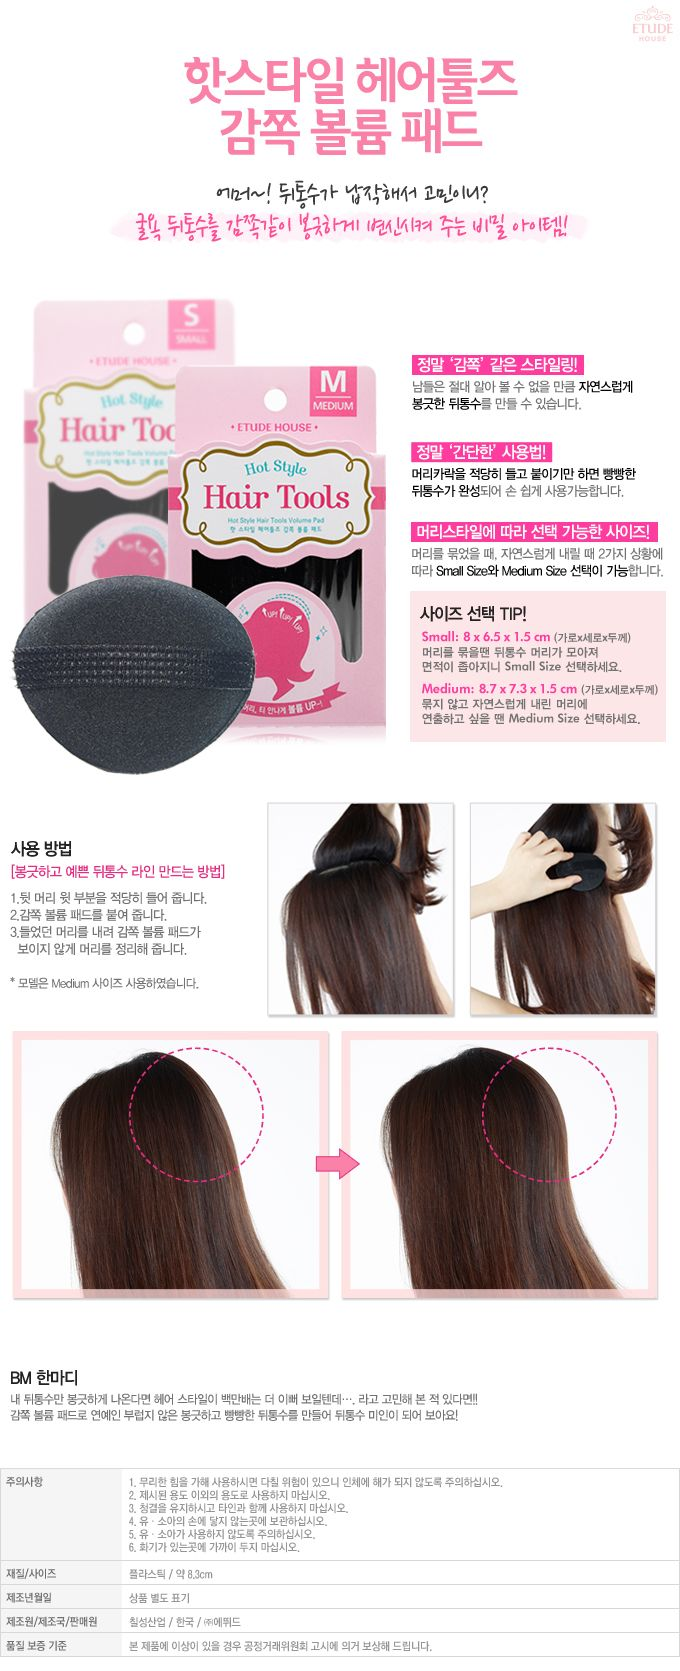 Etude House Korea Jakarta: Etude House Hot Style Hair Tools Volume Pad